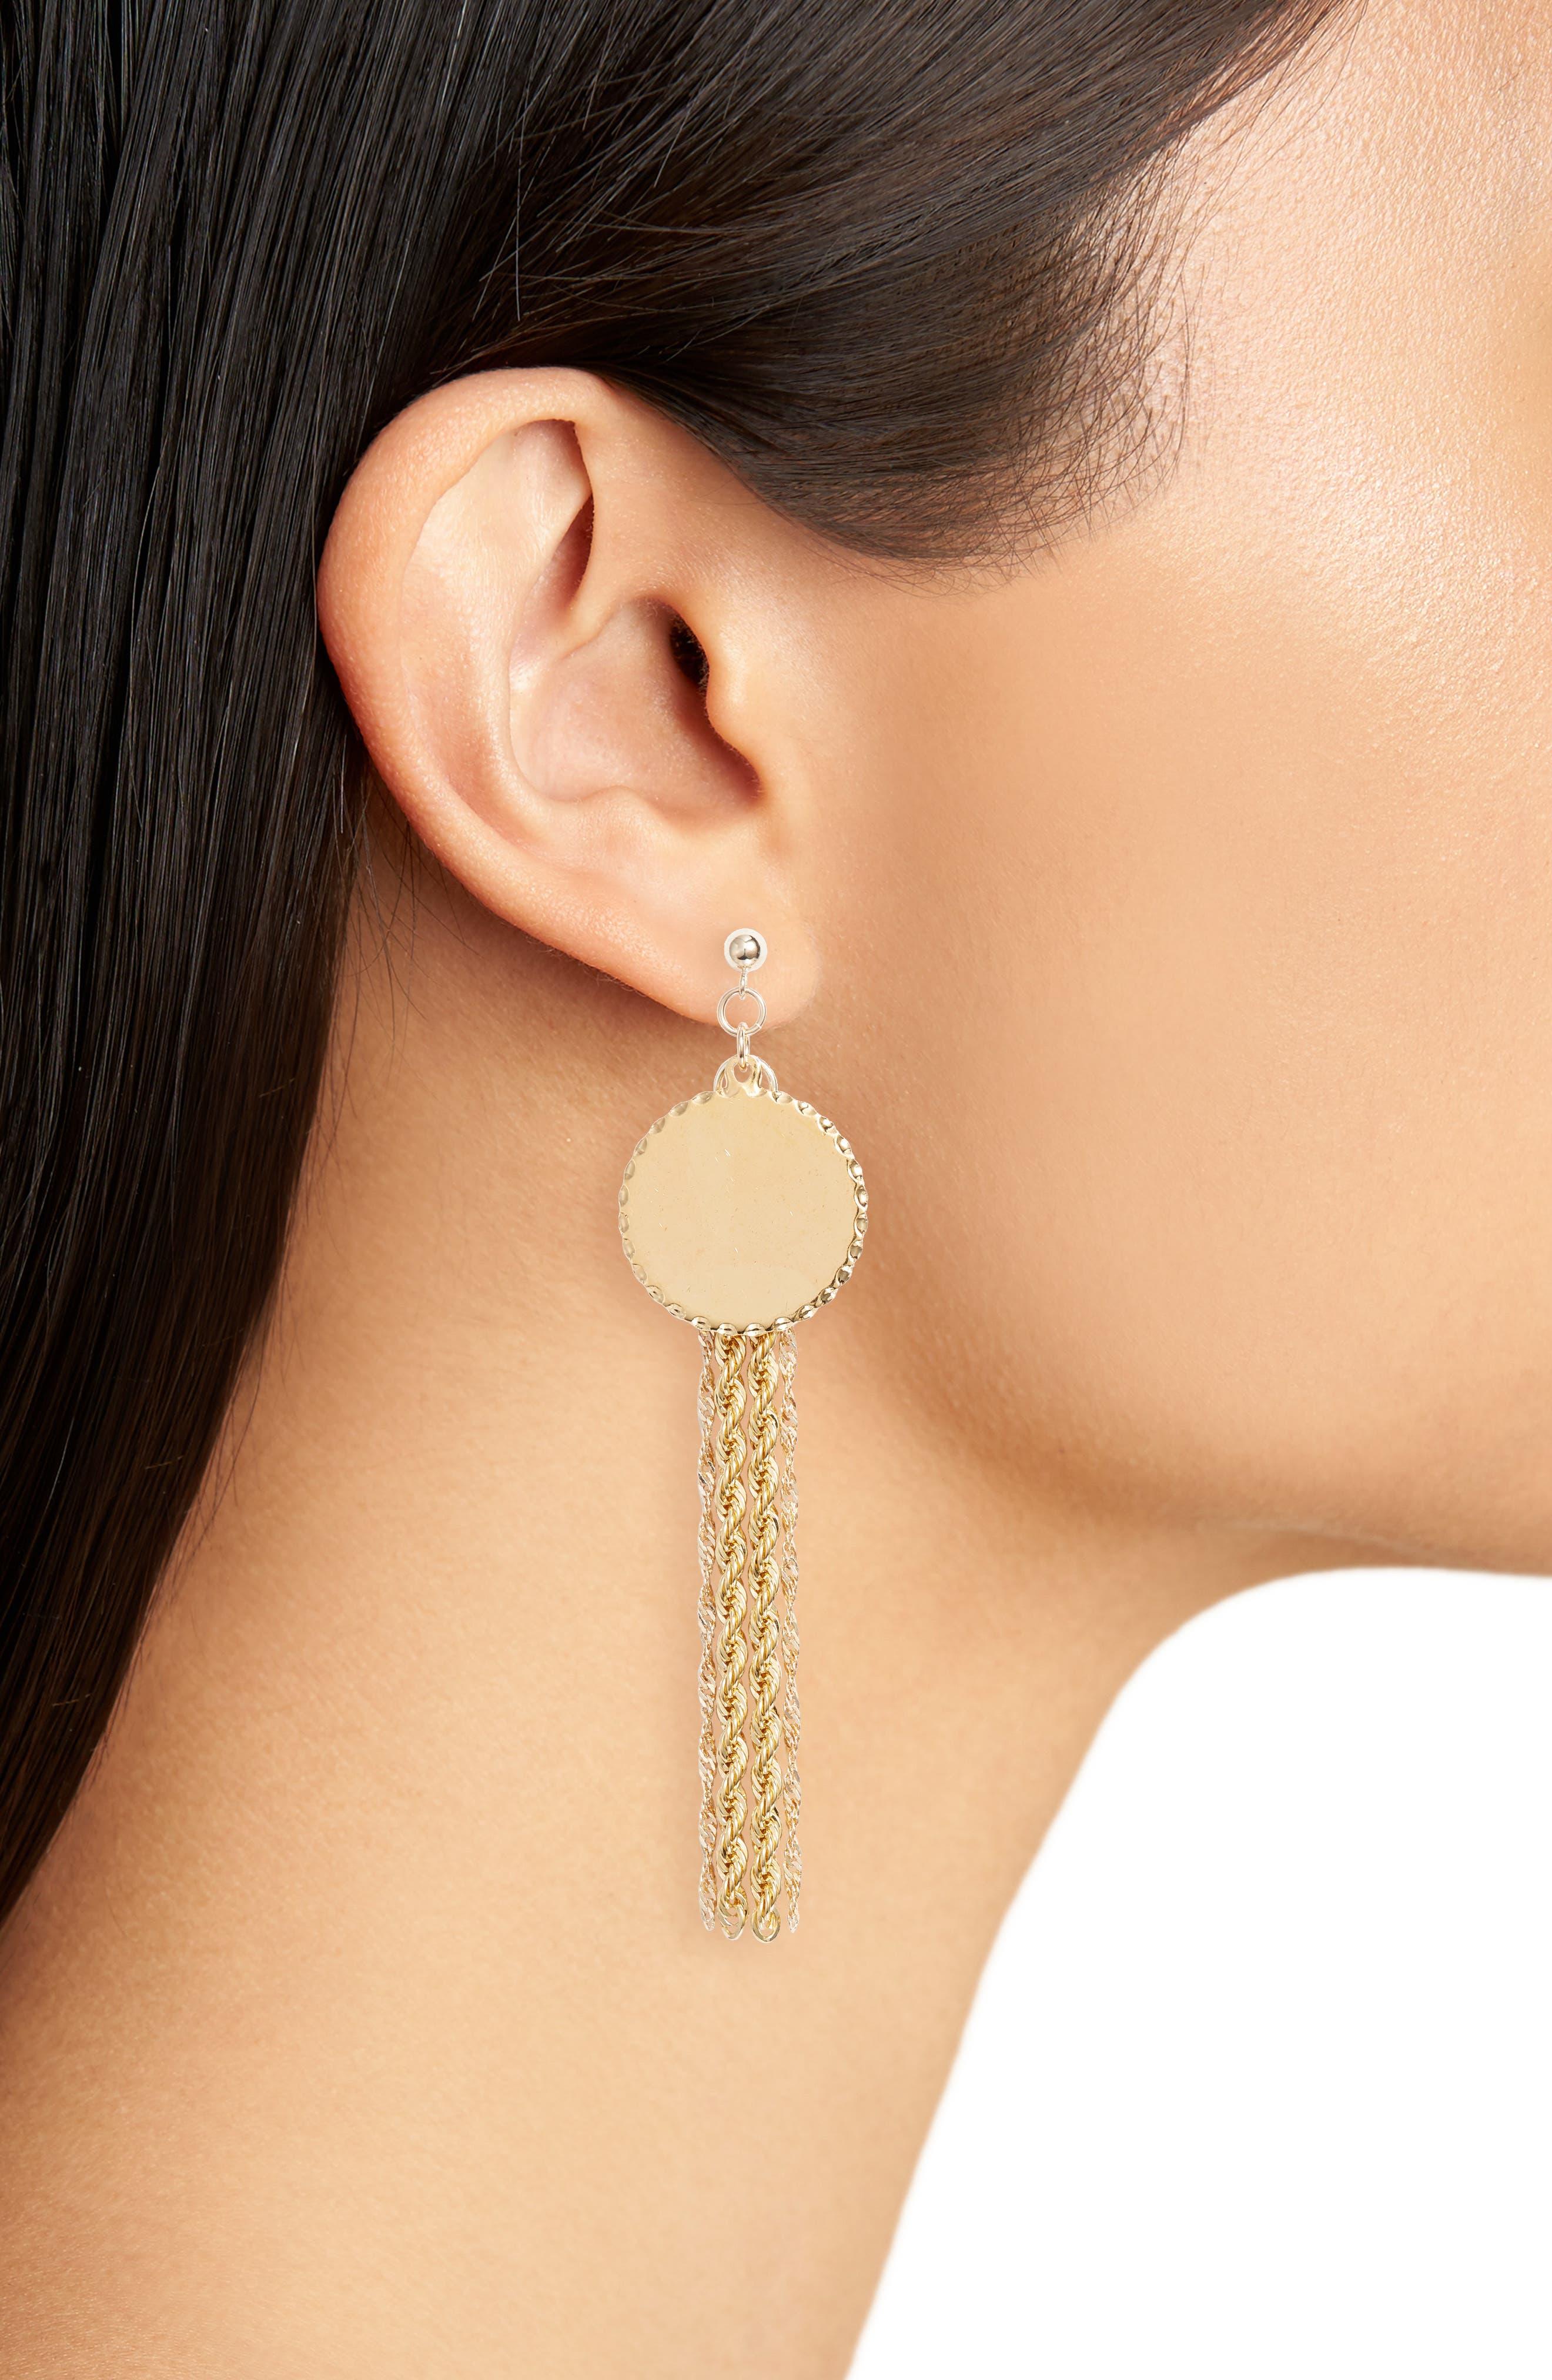 Temperance Chain Fringe Earrings,                             Alternate thumbnail 2, color,                             Yellow Gold